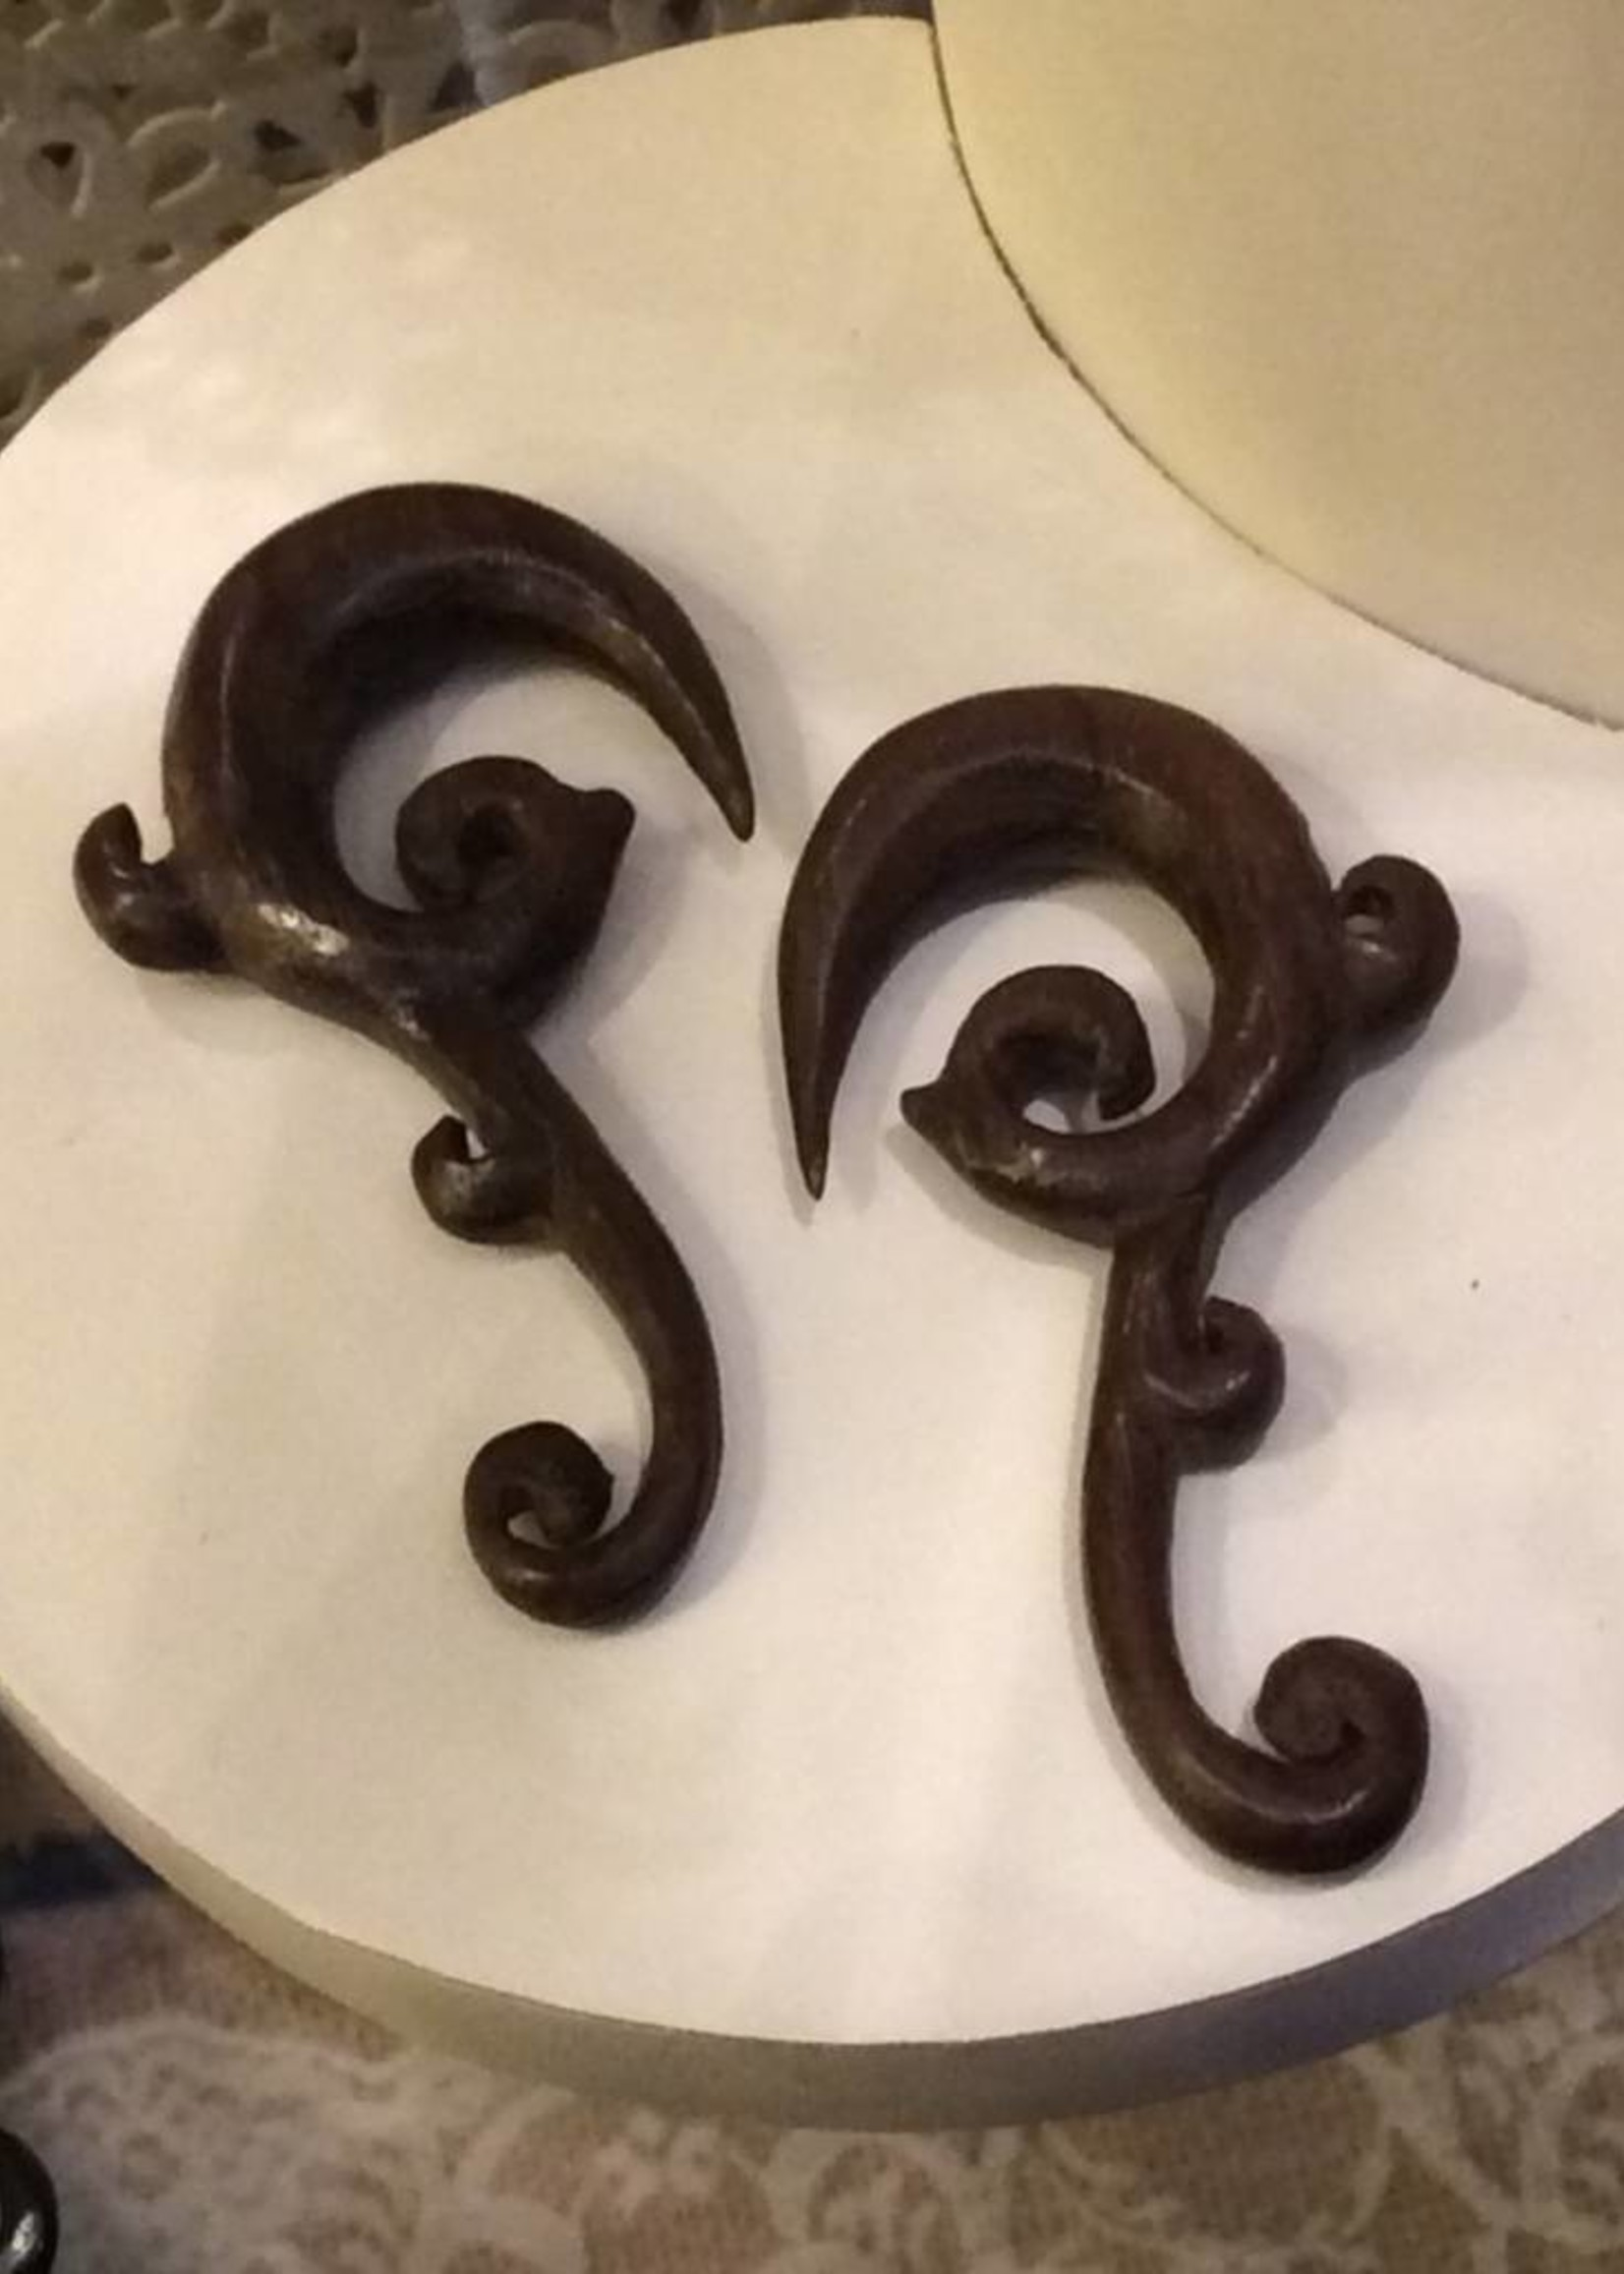 00g Ebony Curled Tip Hangers